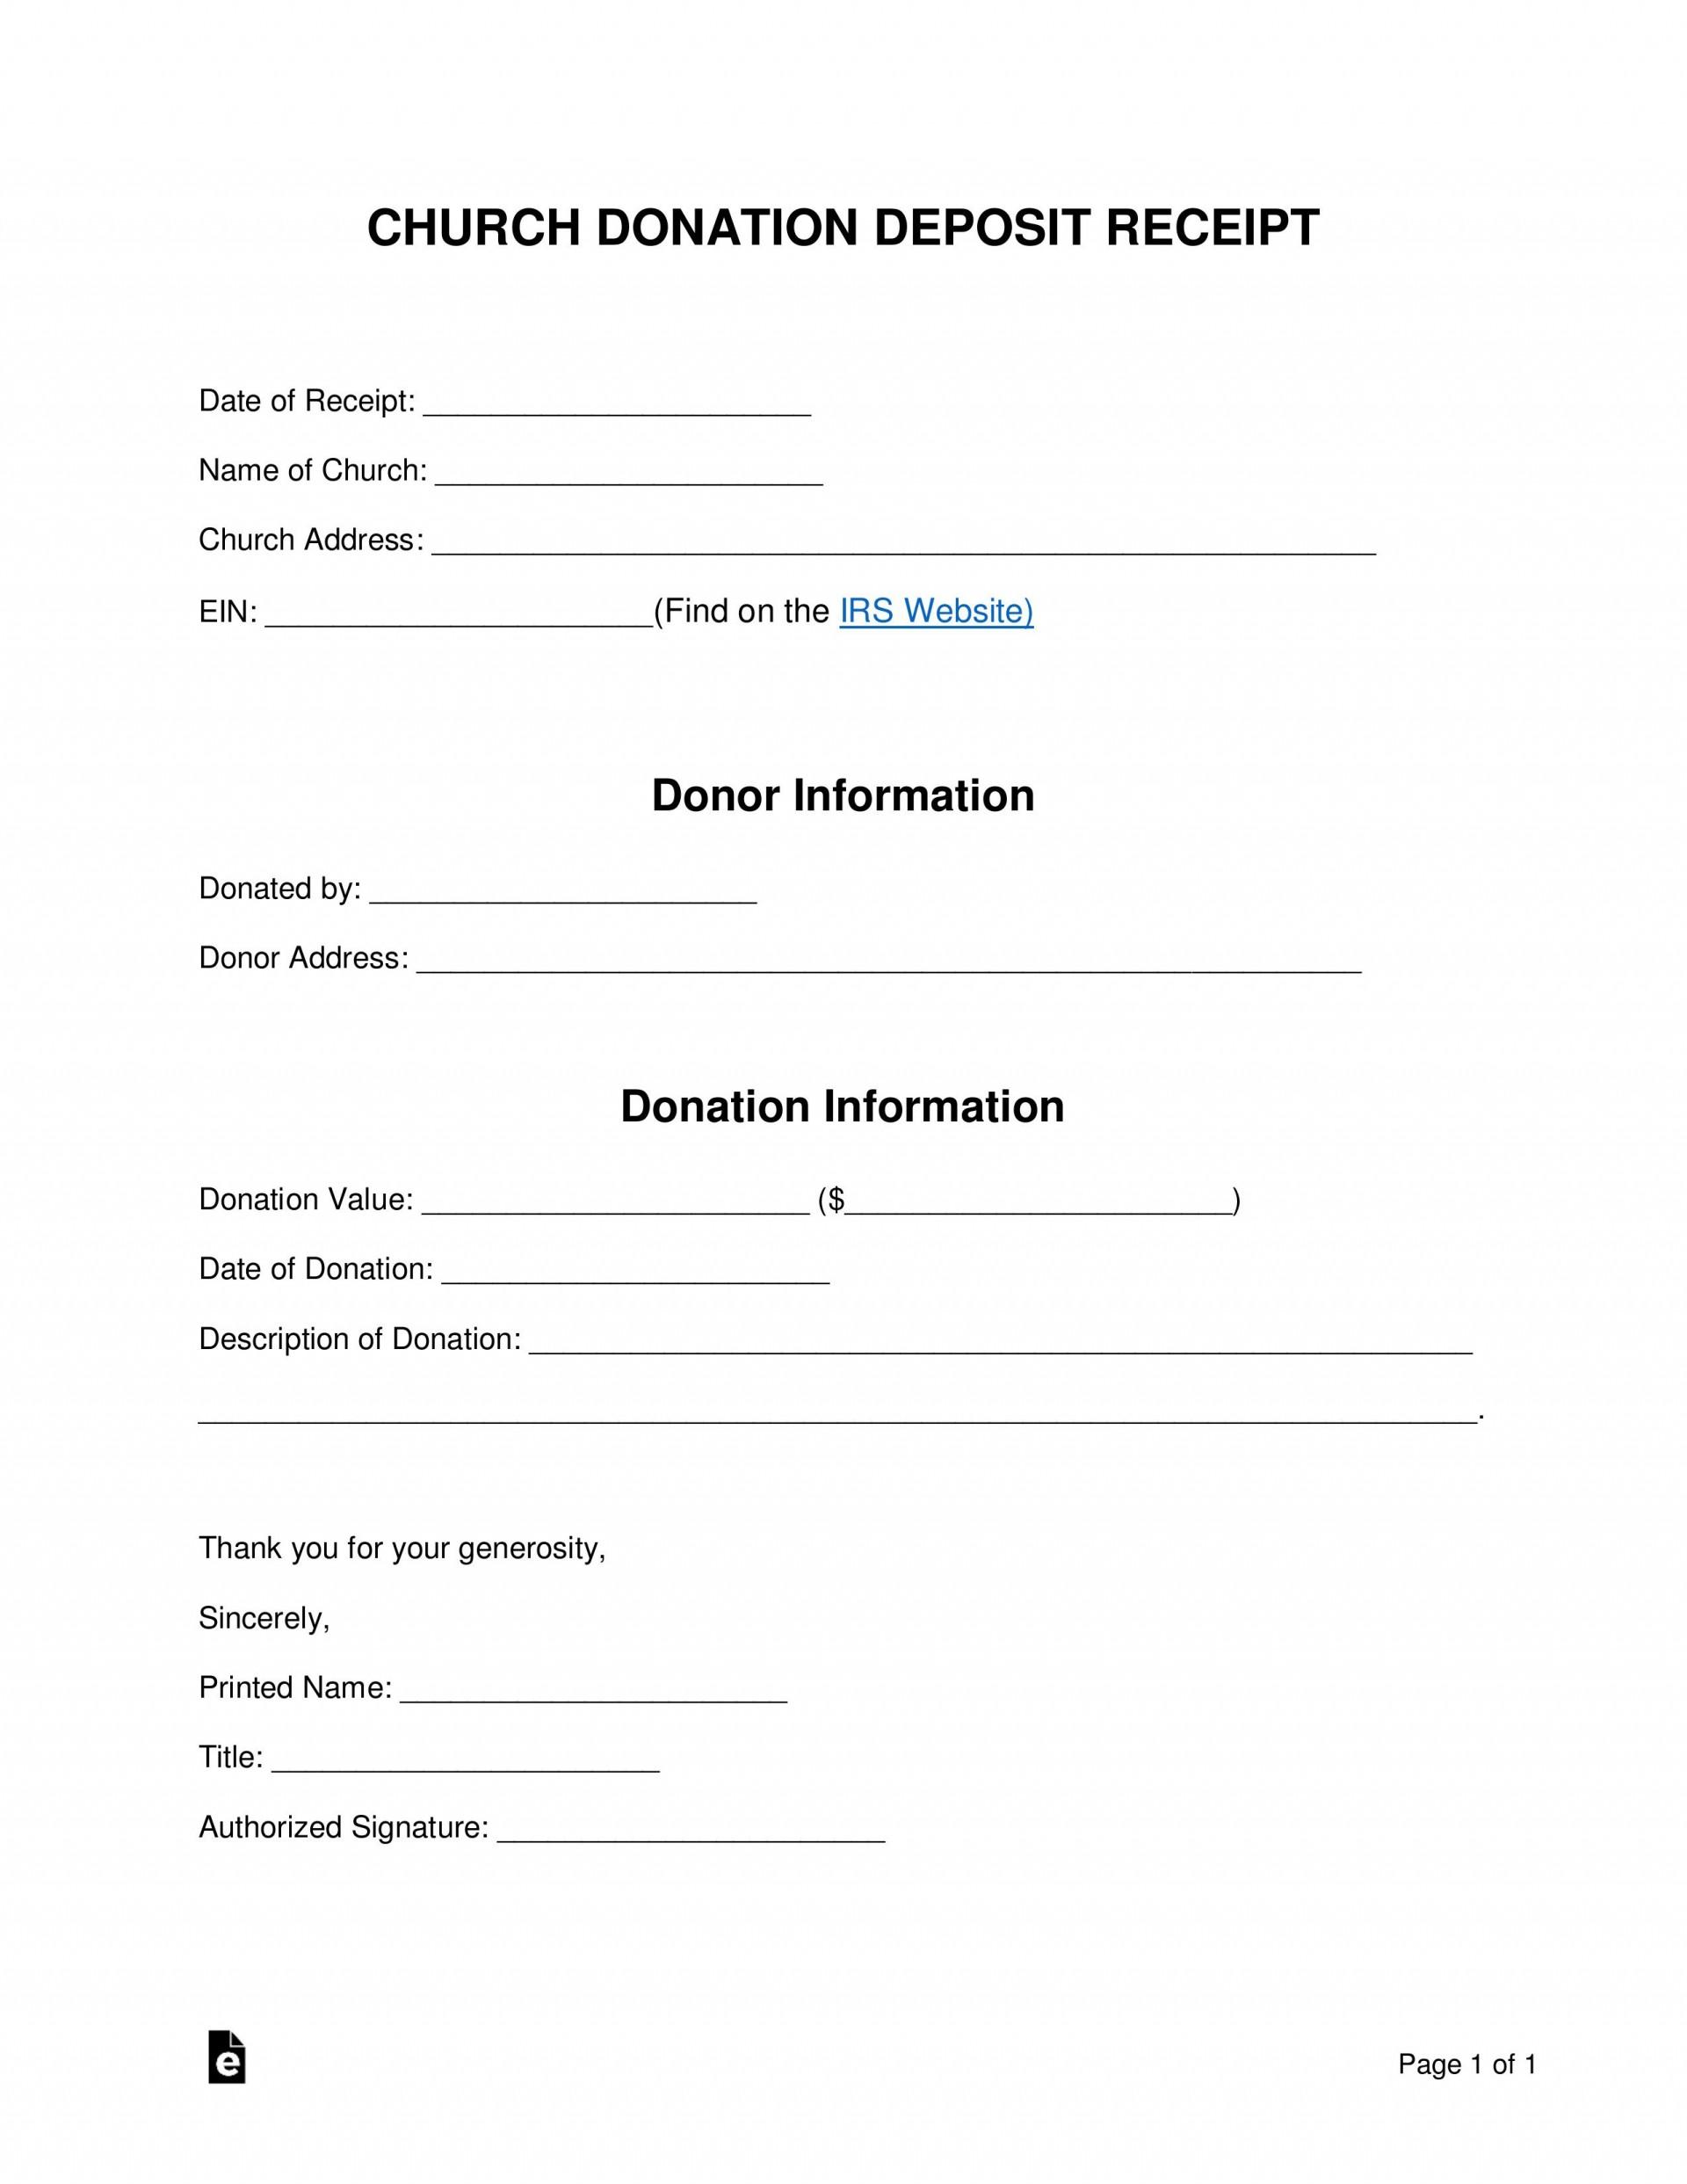 003 Wonderful Tax Donation Receipt Template High Def  Canadian Charitable Letter Church Deduction1920